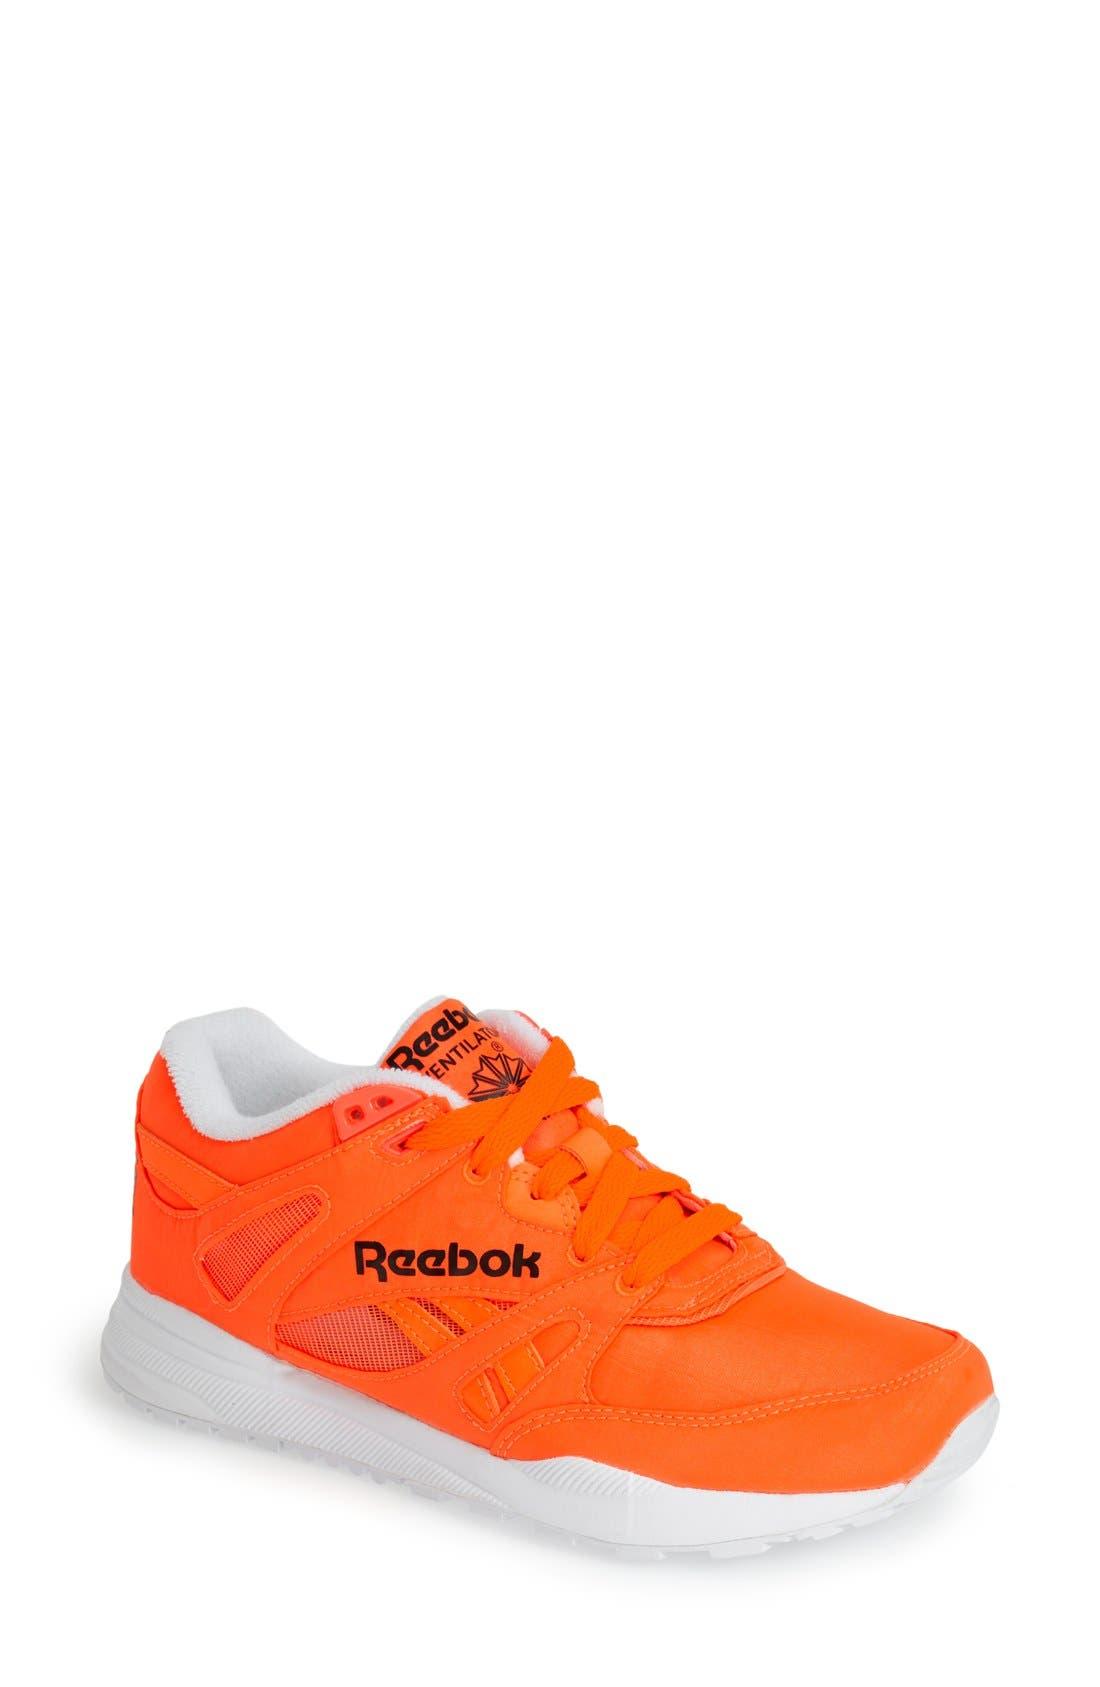 Alternate Image 1 Selected - Reebok 'Ventilator' Sneaker (Women)